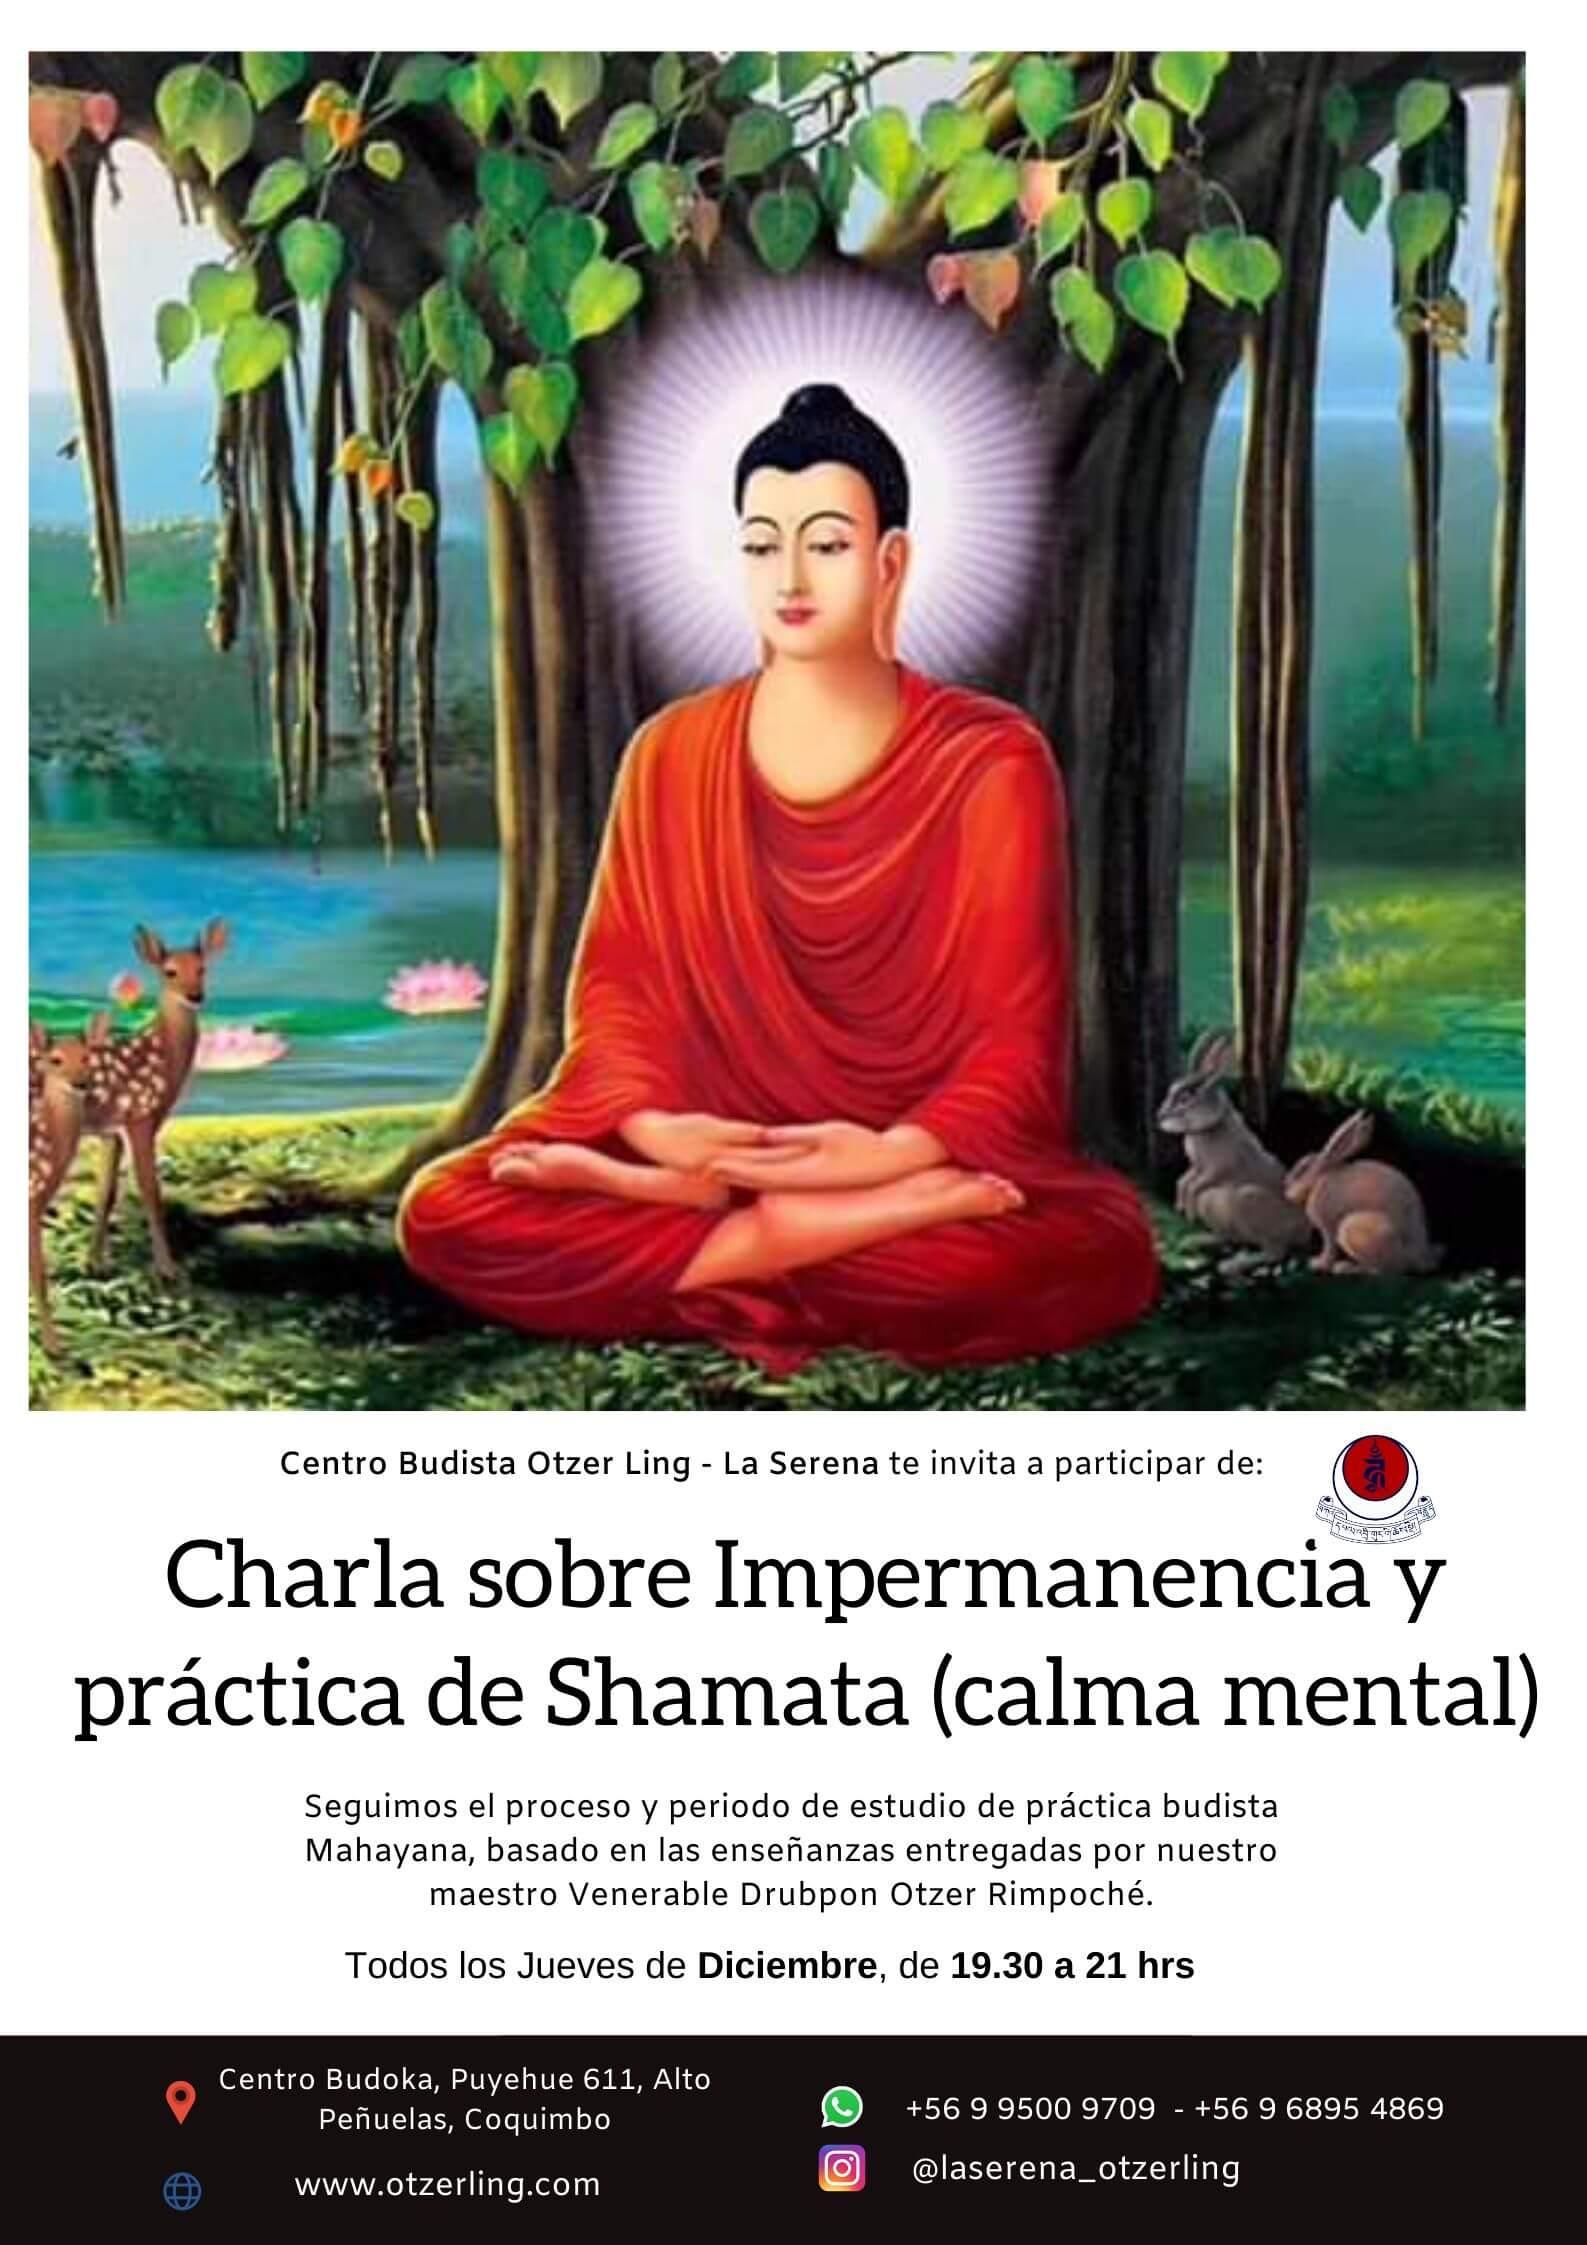 Charla sobre Impermanencia y práctica de Shamata (calma mental)